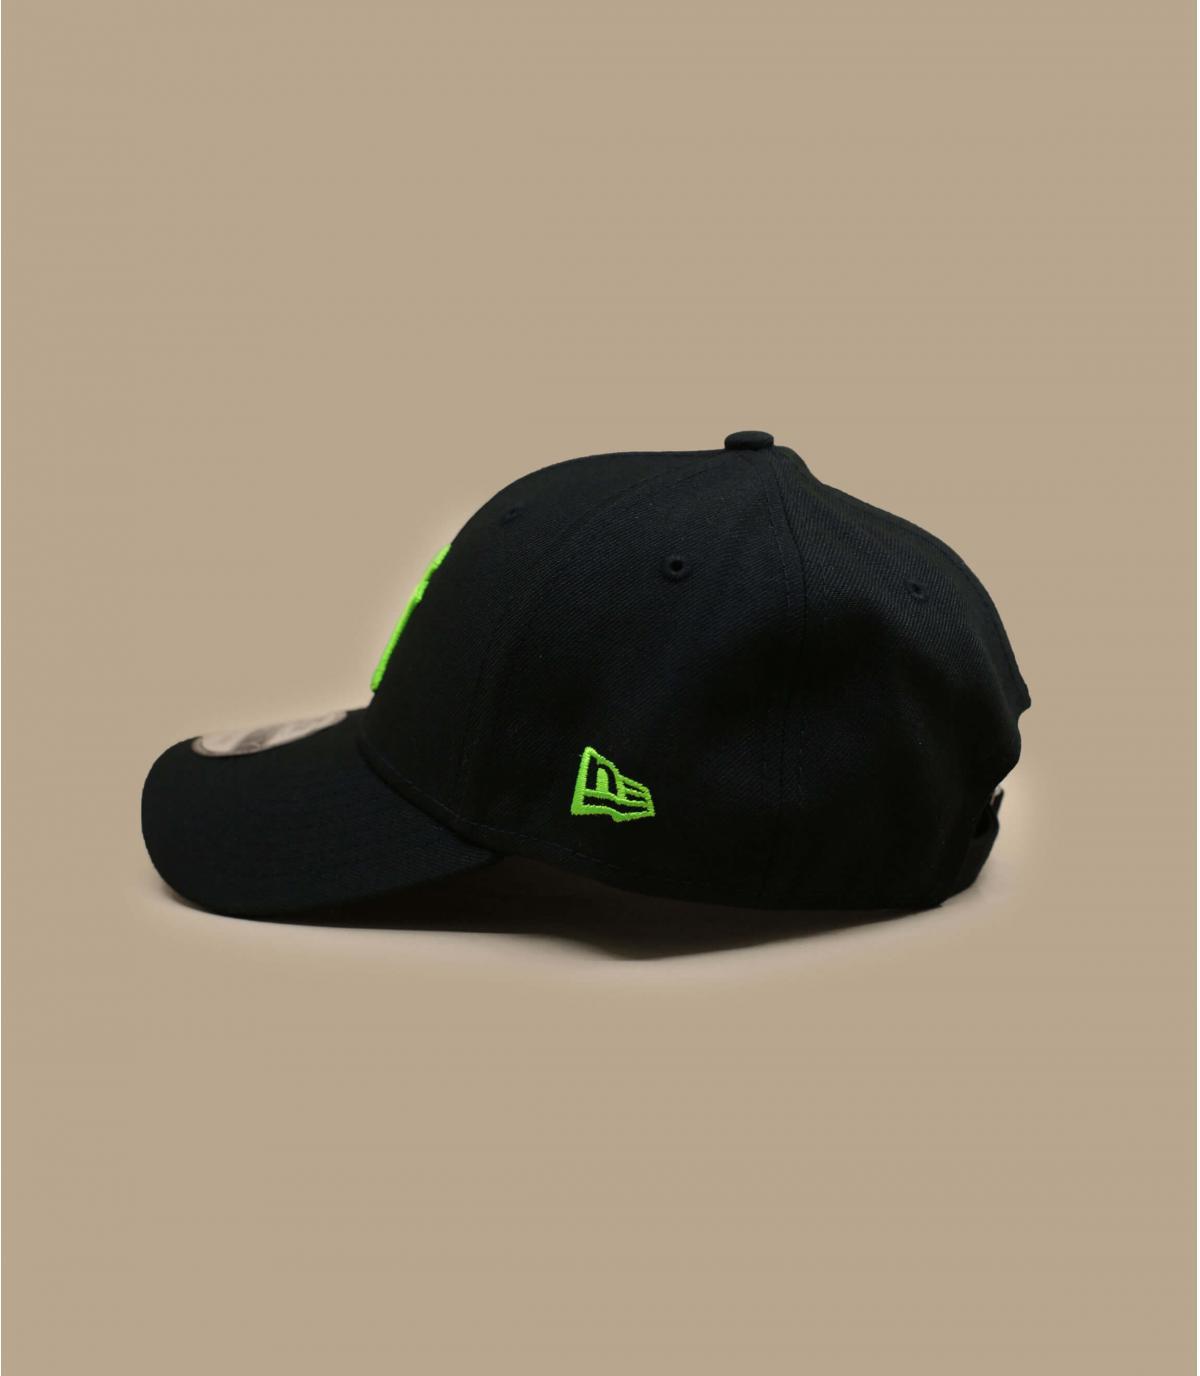 Détails Casquette Neon Pack NY 940 black green - image 3